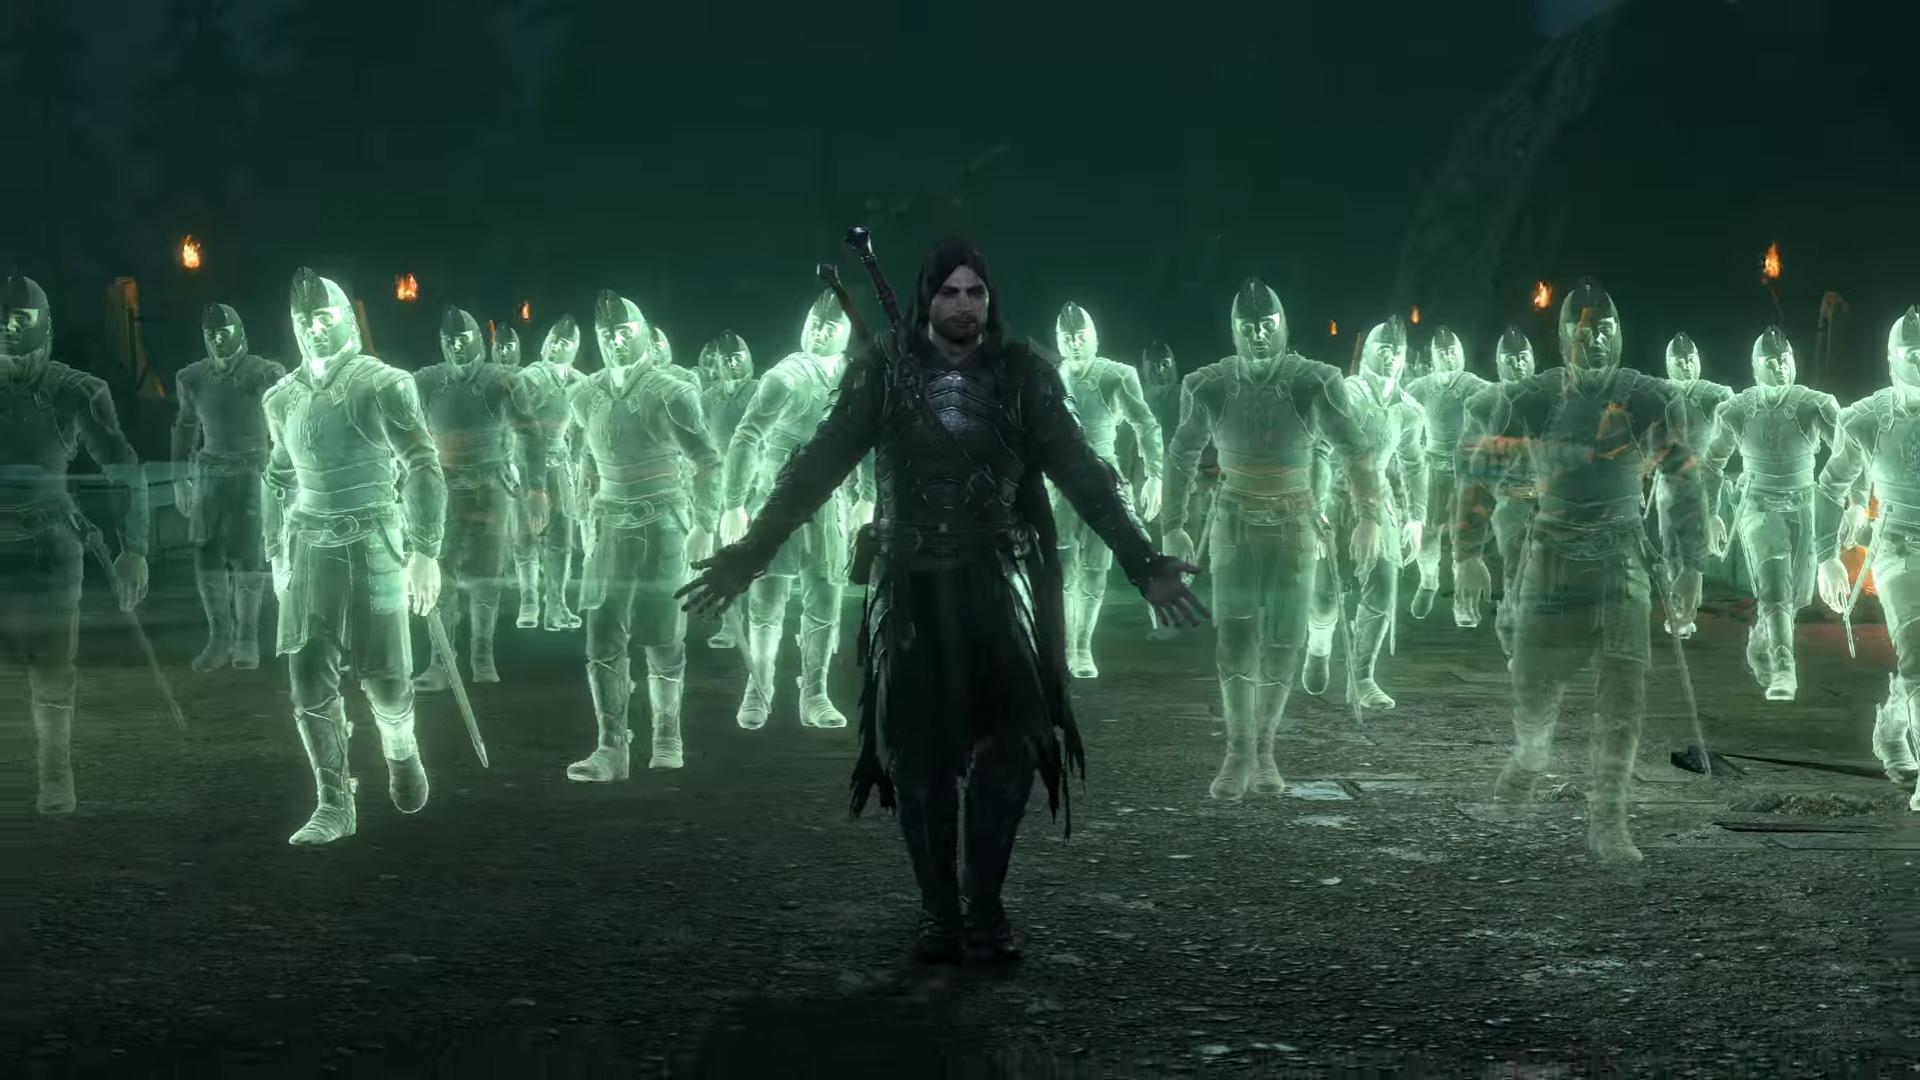 Shadow Of War Hd Wallpaper: Middle-earth: Shadow Of War Image